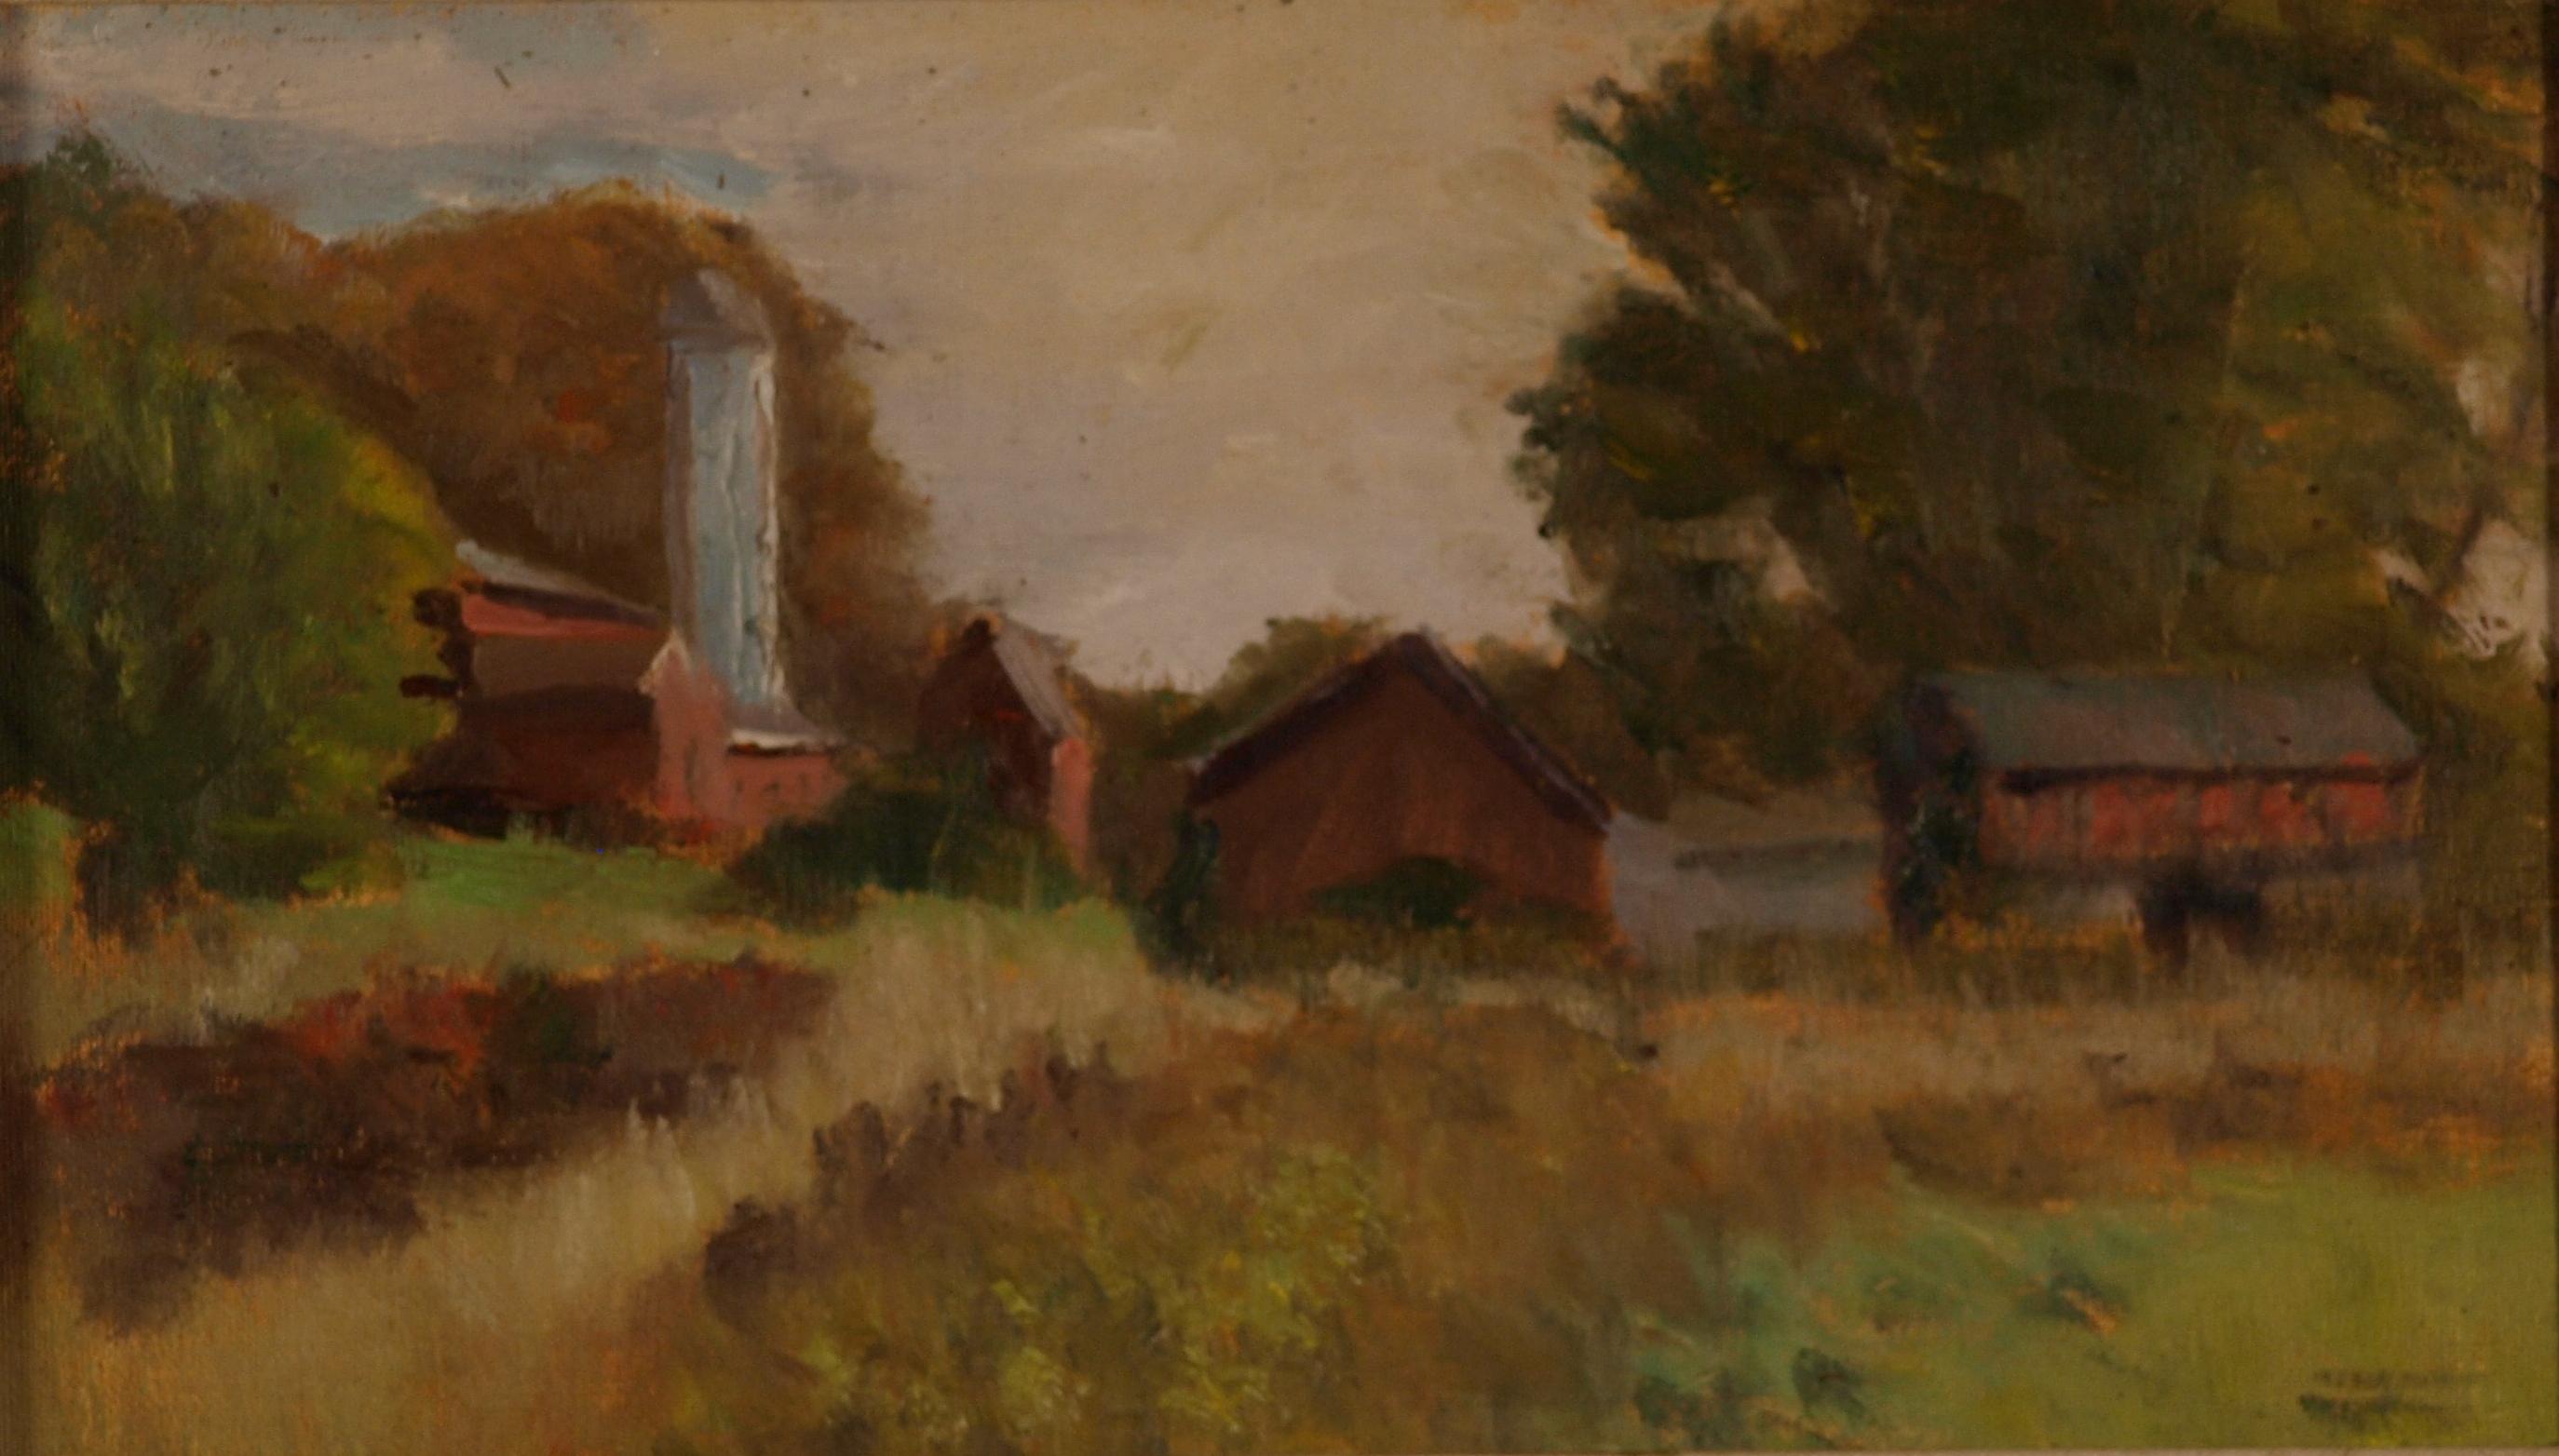 Autumn - Osbourne Farm, Oil on Canvas on Panel, 8 x 14 Inches, by Richard Stalter, $225